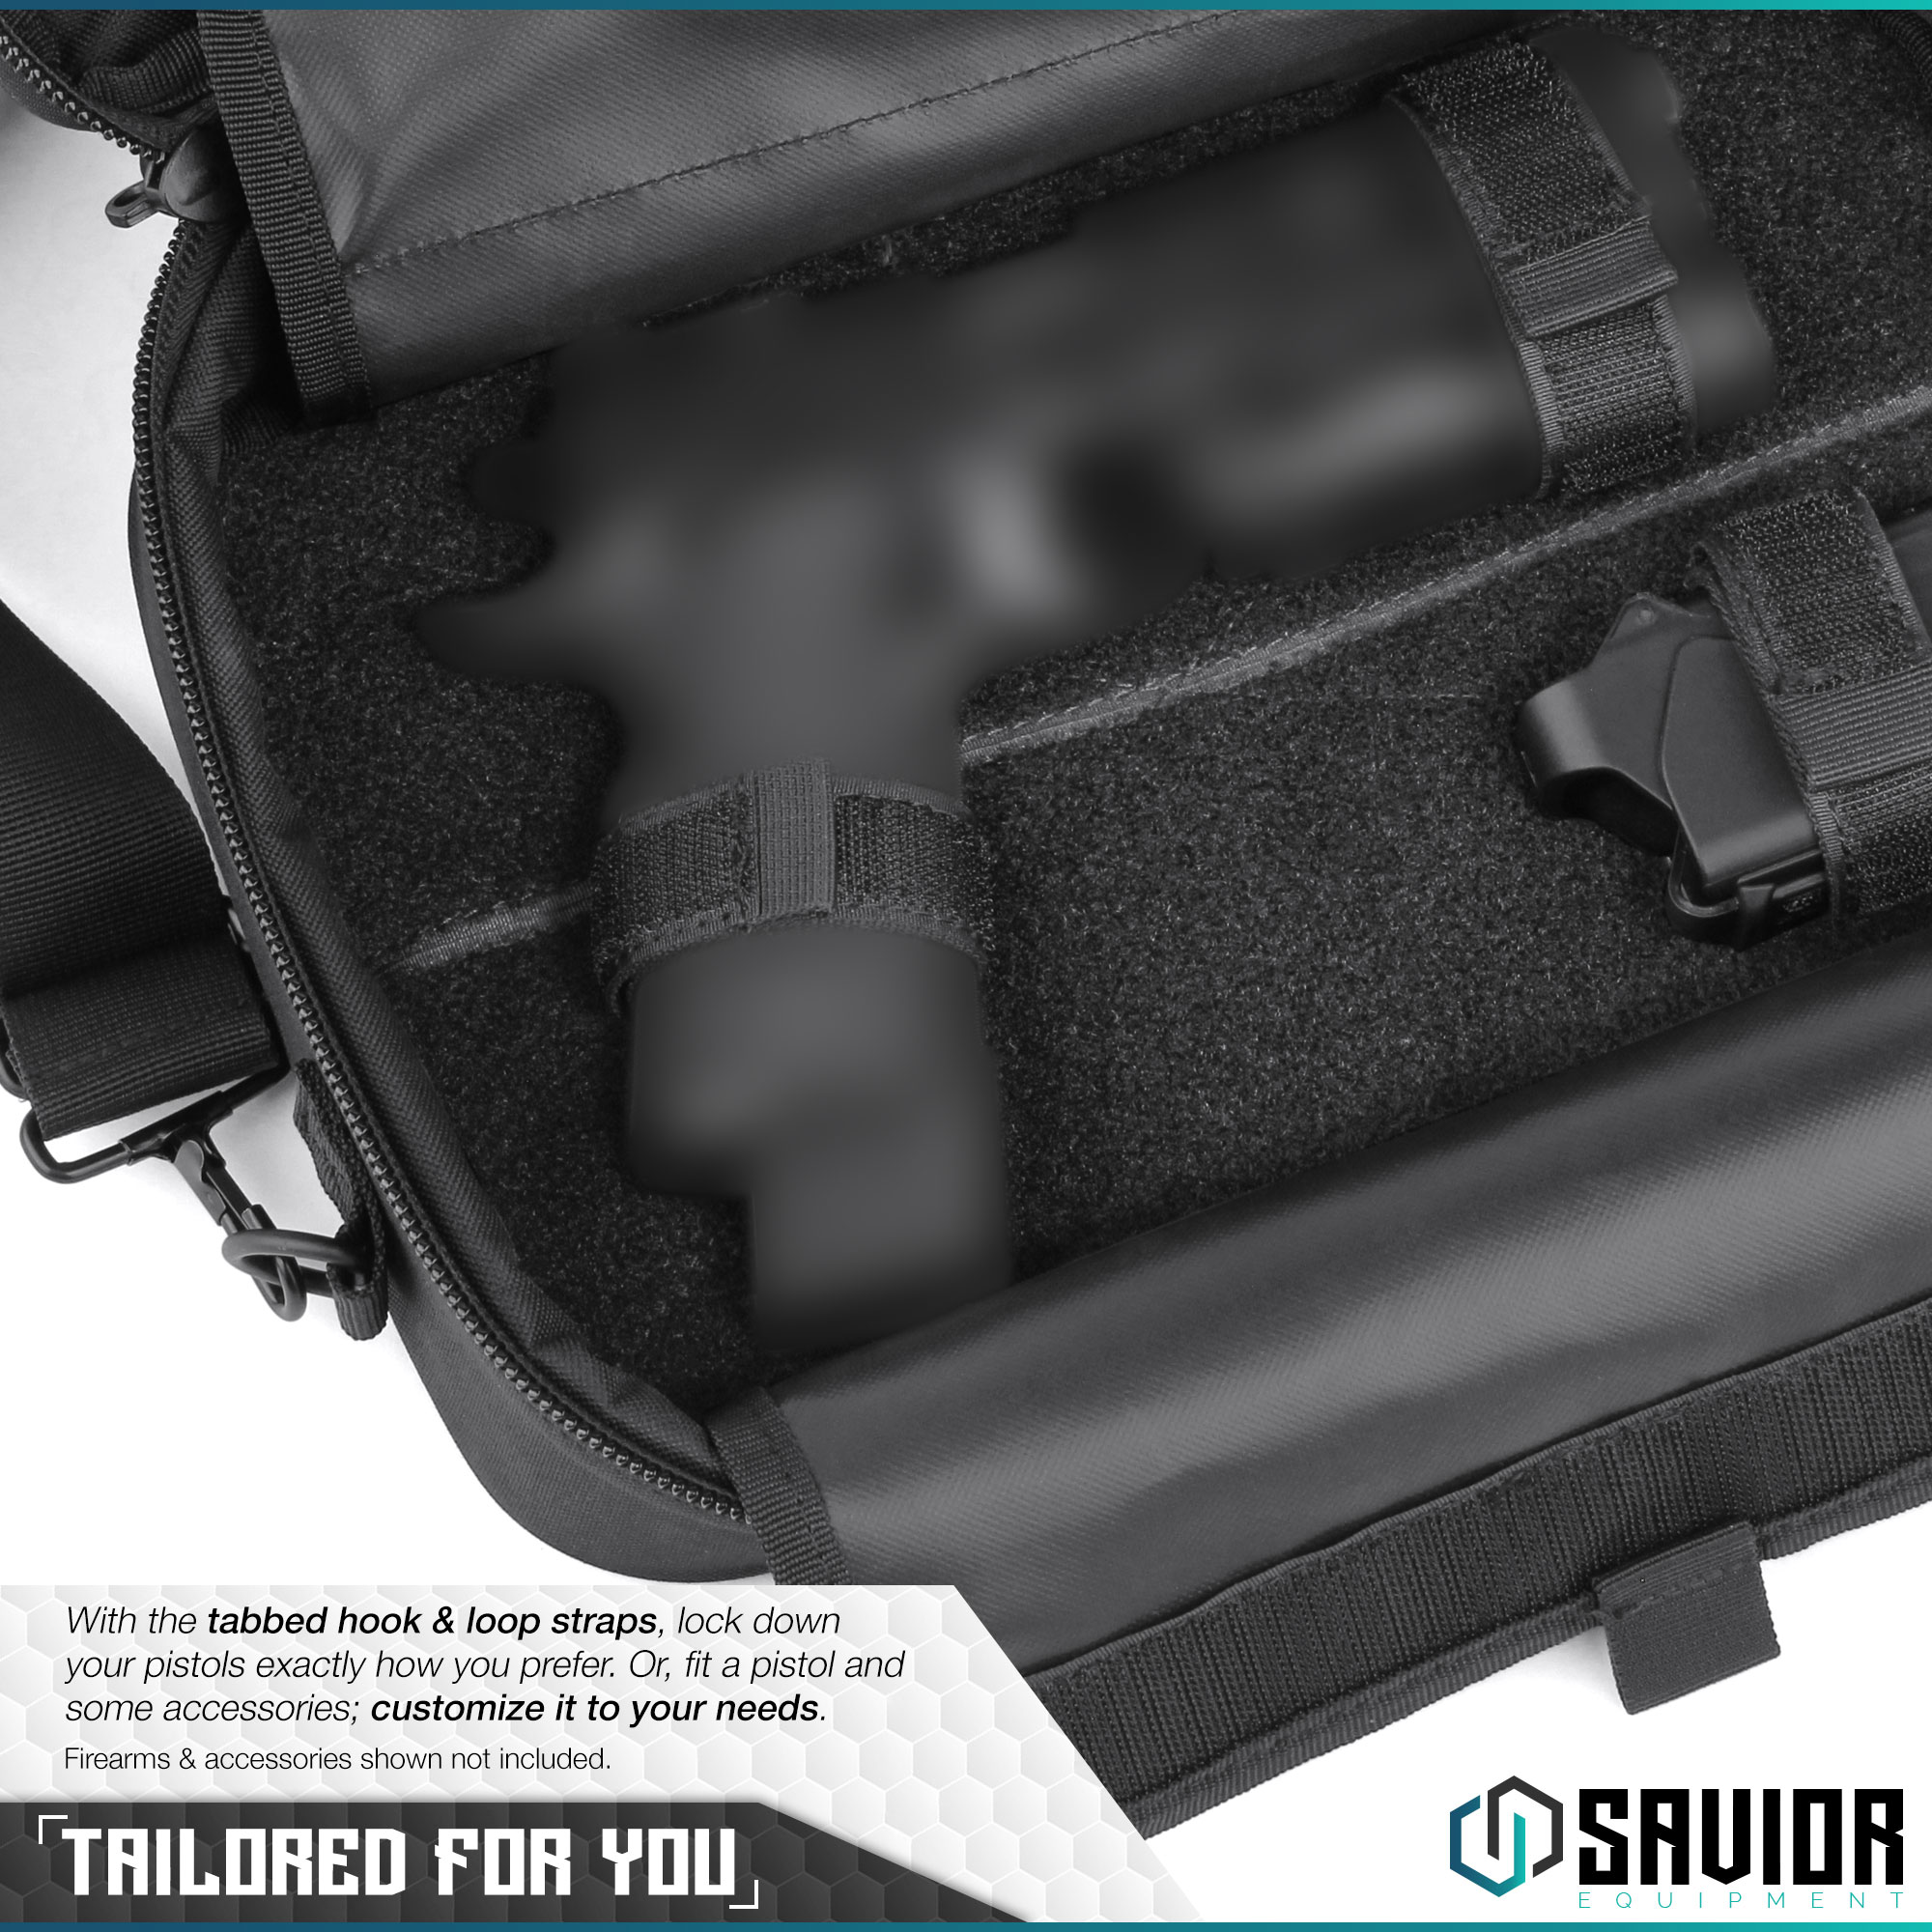 thumbnail 16 - 034-SAVIOR-034-Padded-Discreet-Double-Handgun-Bag-Pistol-Storage-Case-w-Mag-Pouch-Slot